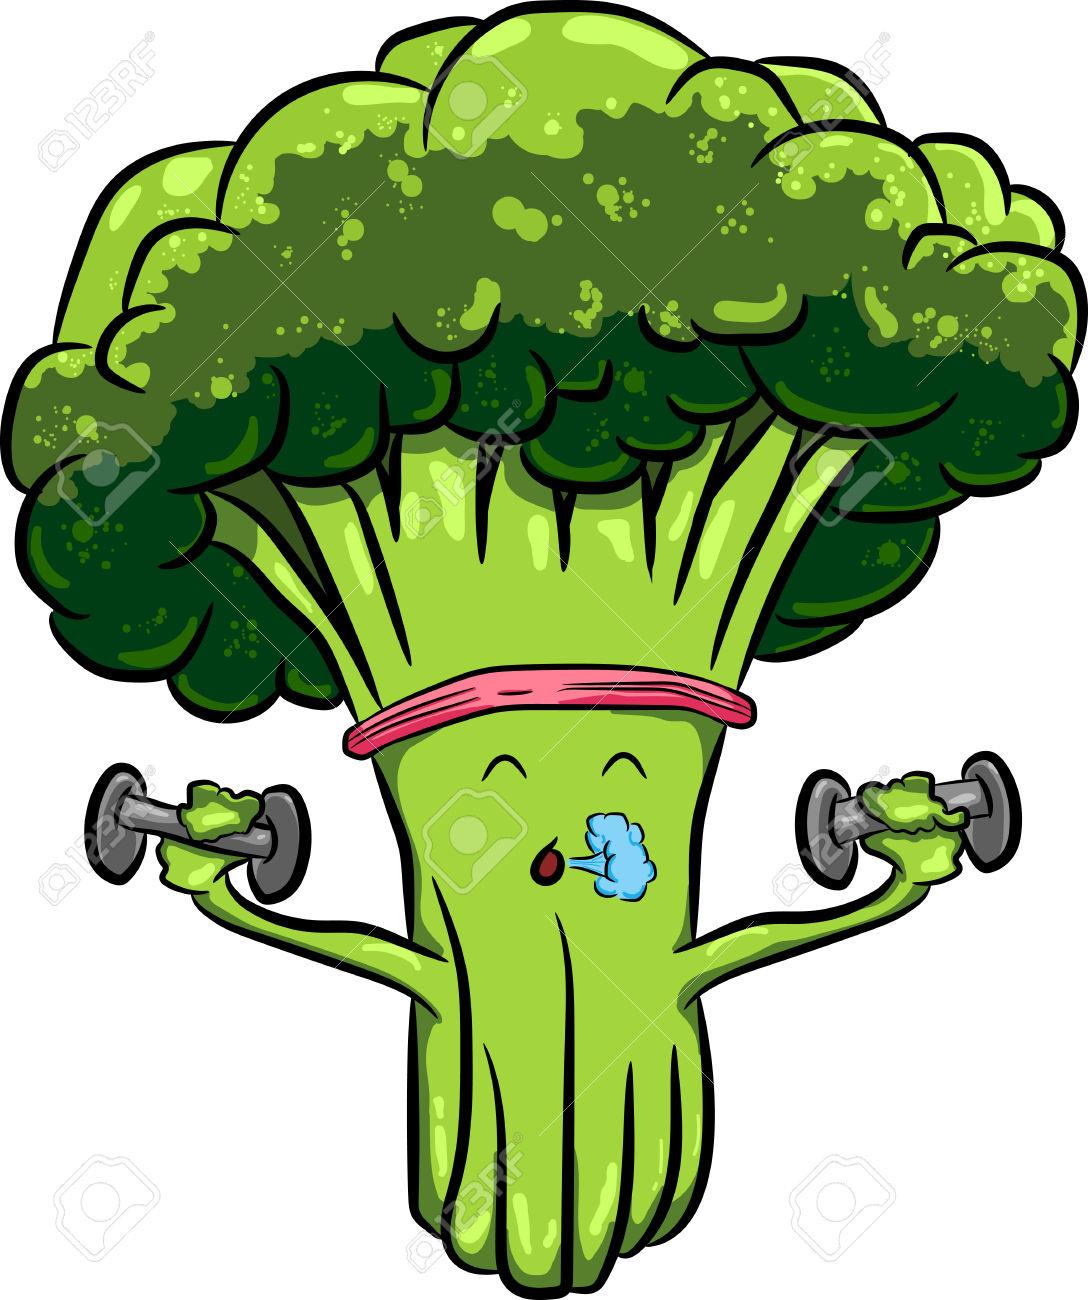 Broccoli Clipart for free.